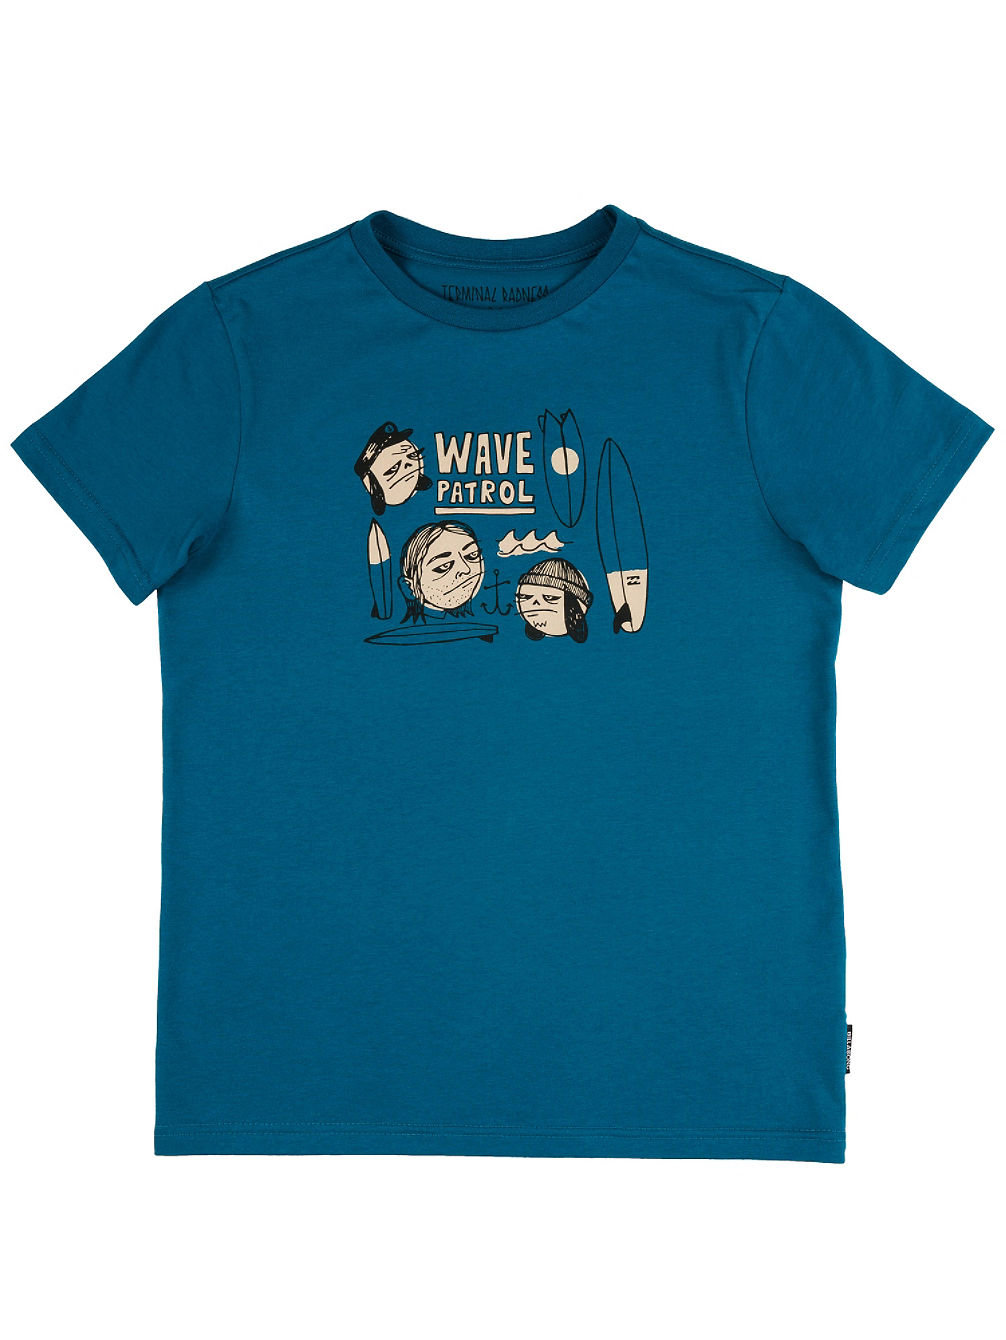 billabong tr whatever t shirt jungen online kaufen bei blue. Black Bedroom Furniture Sets. Home Design Ideas